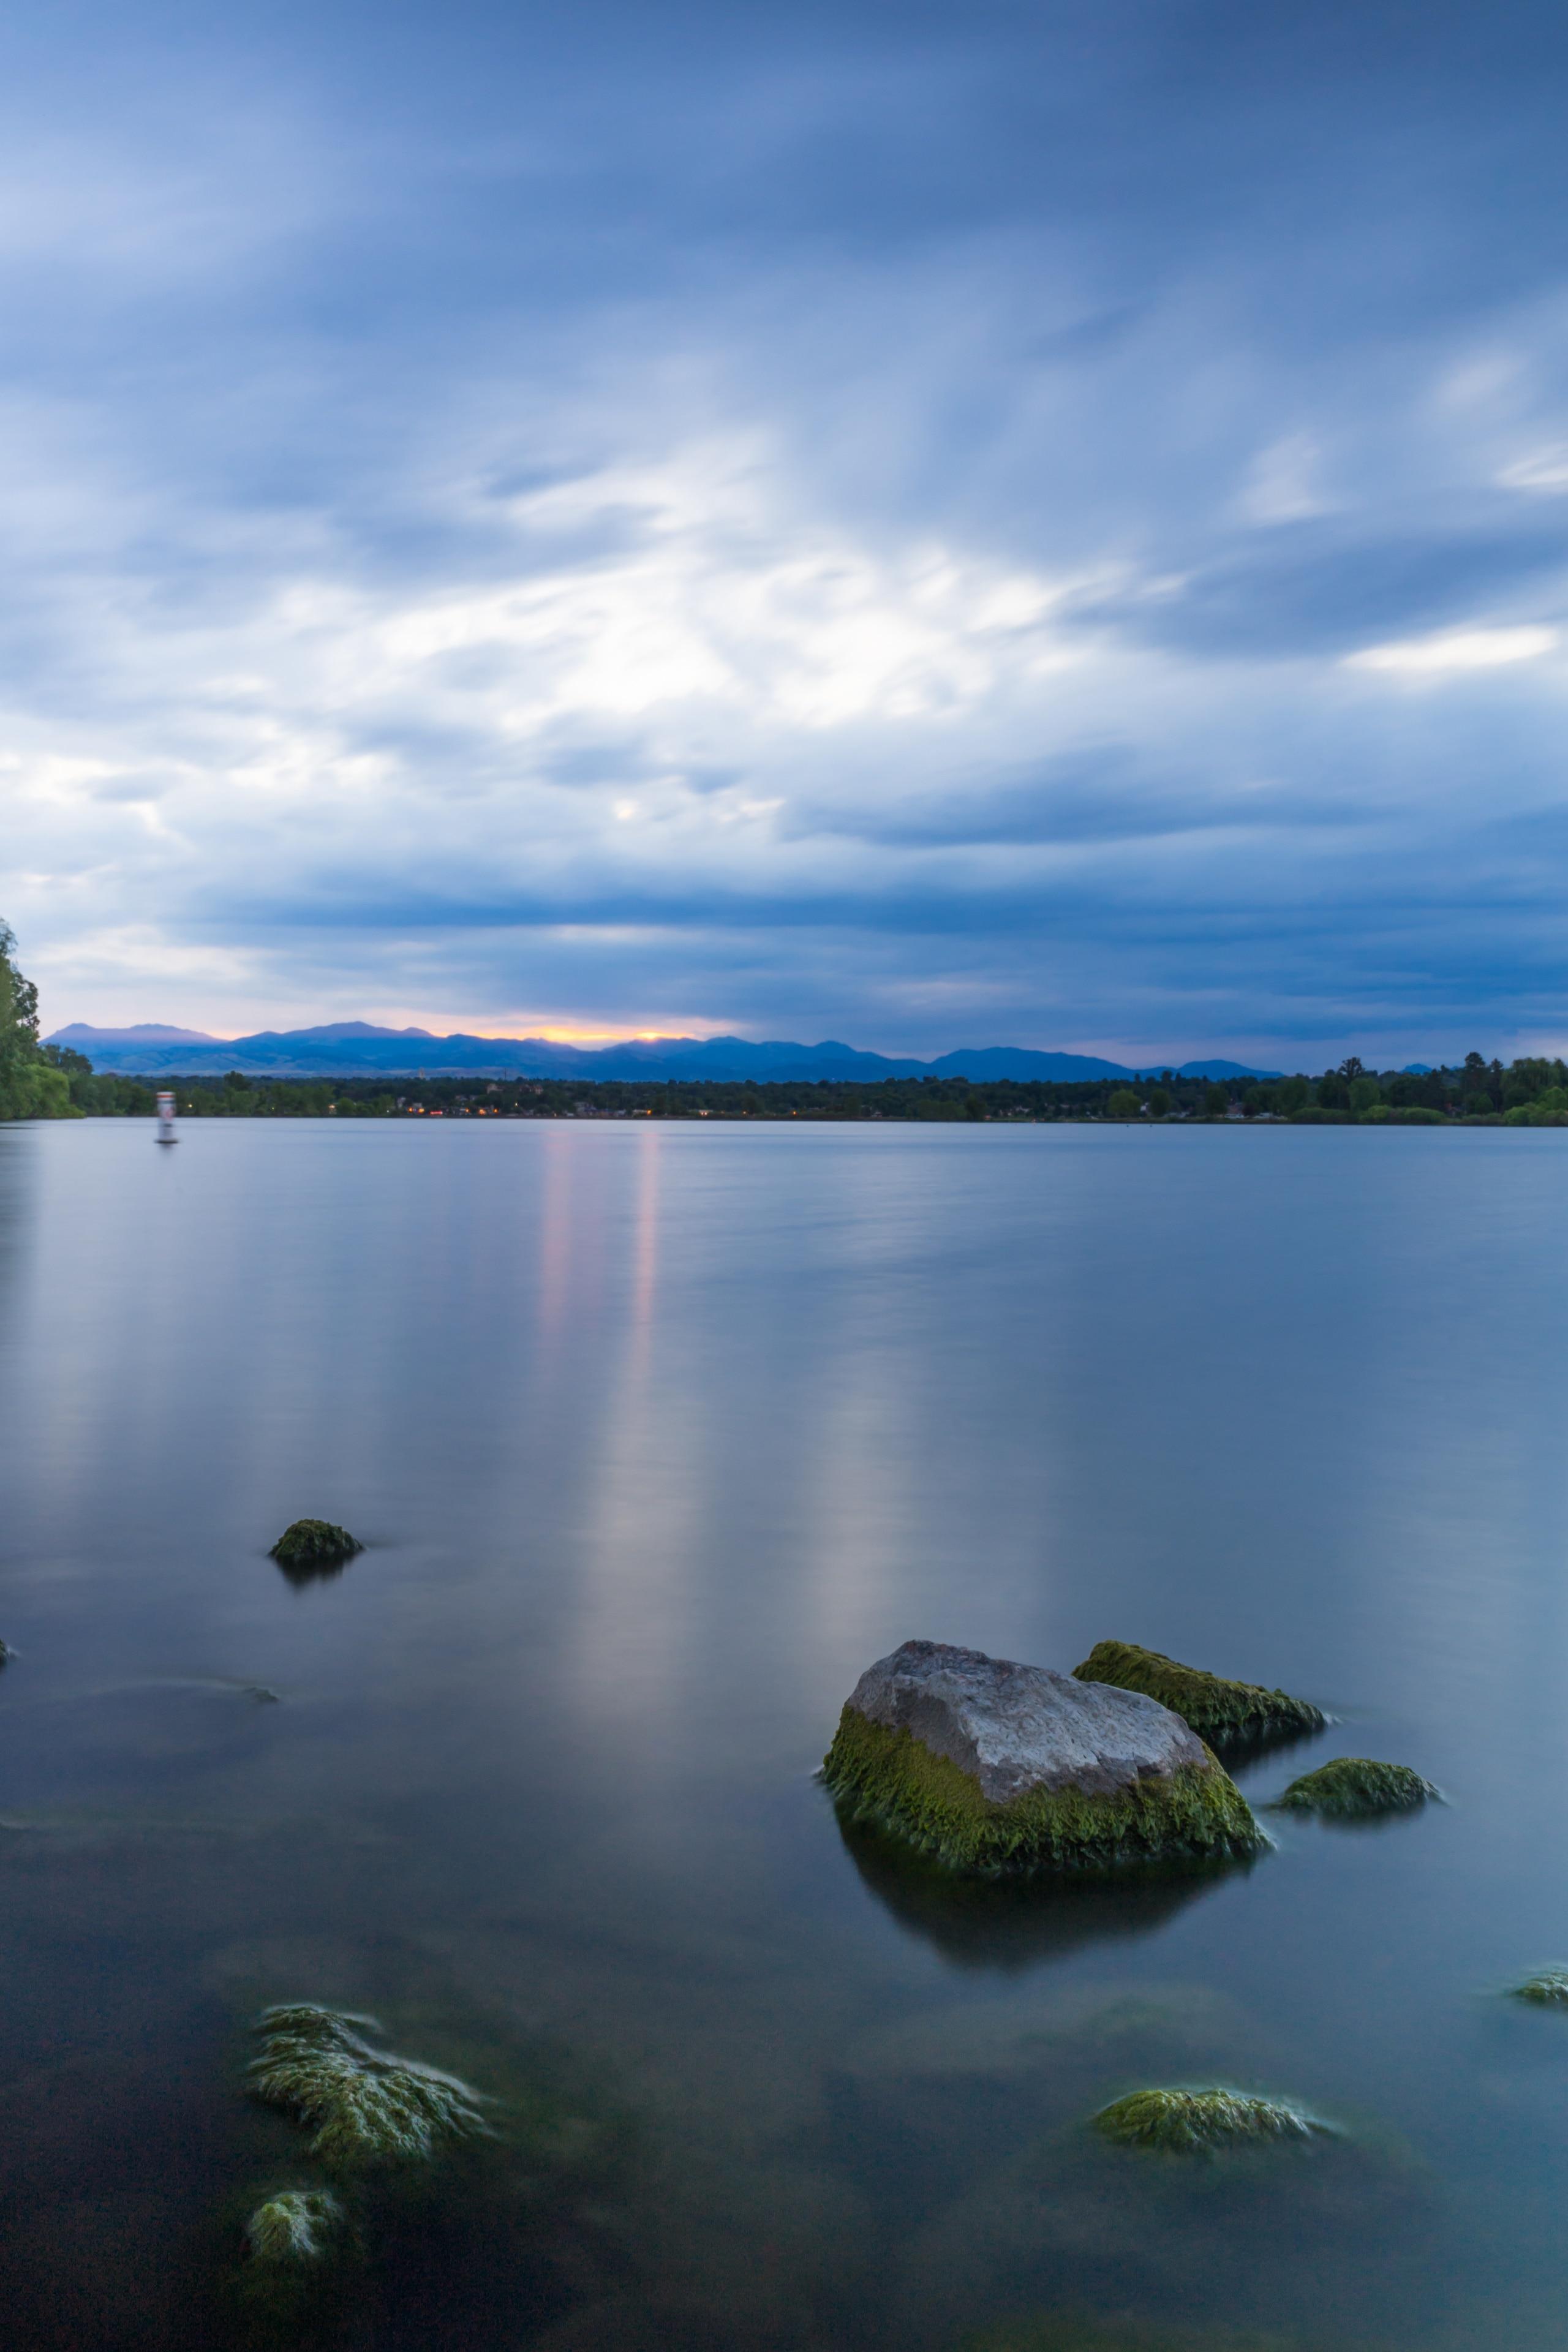 Sloan Lake, Denver, Colorado, United States of America